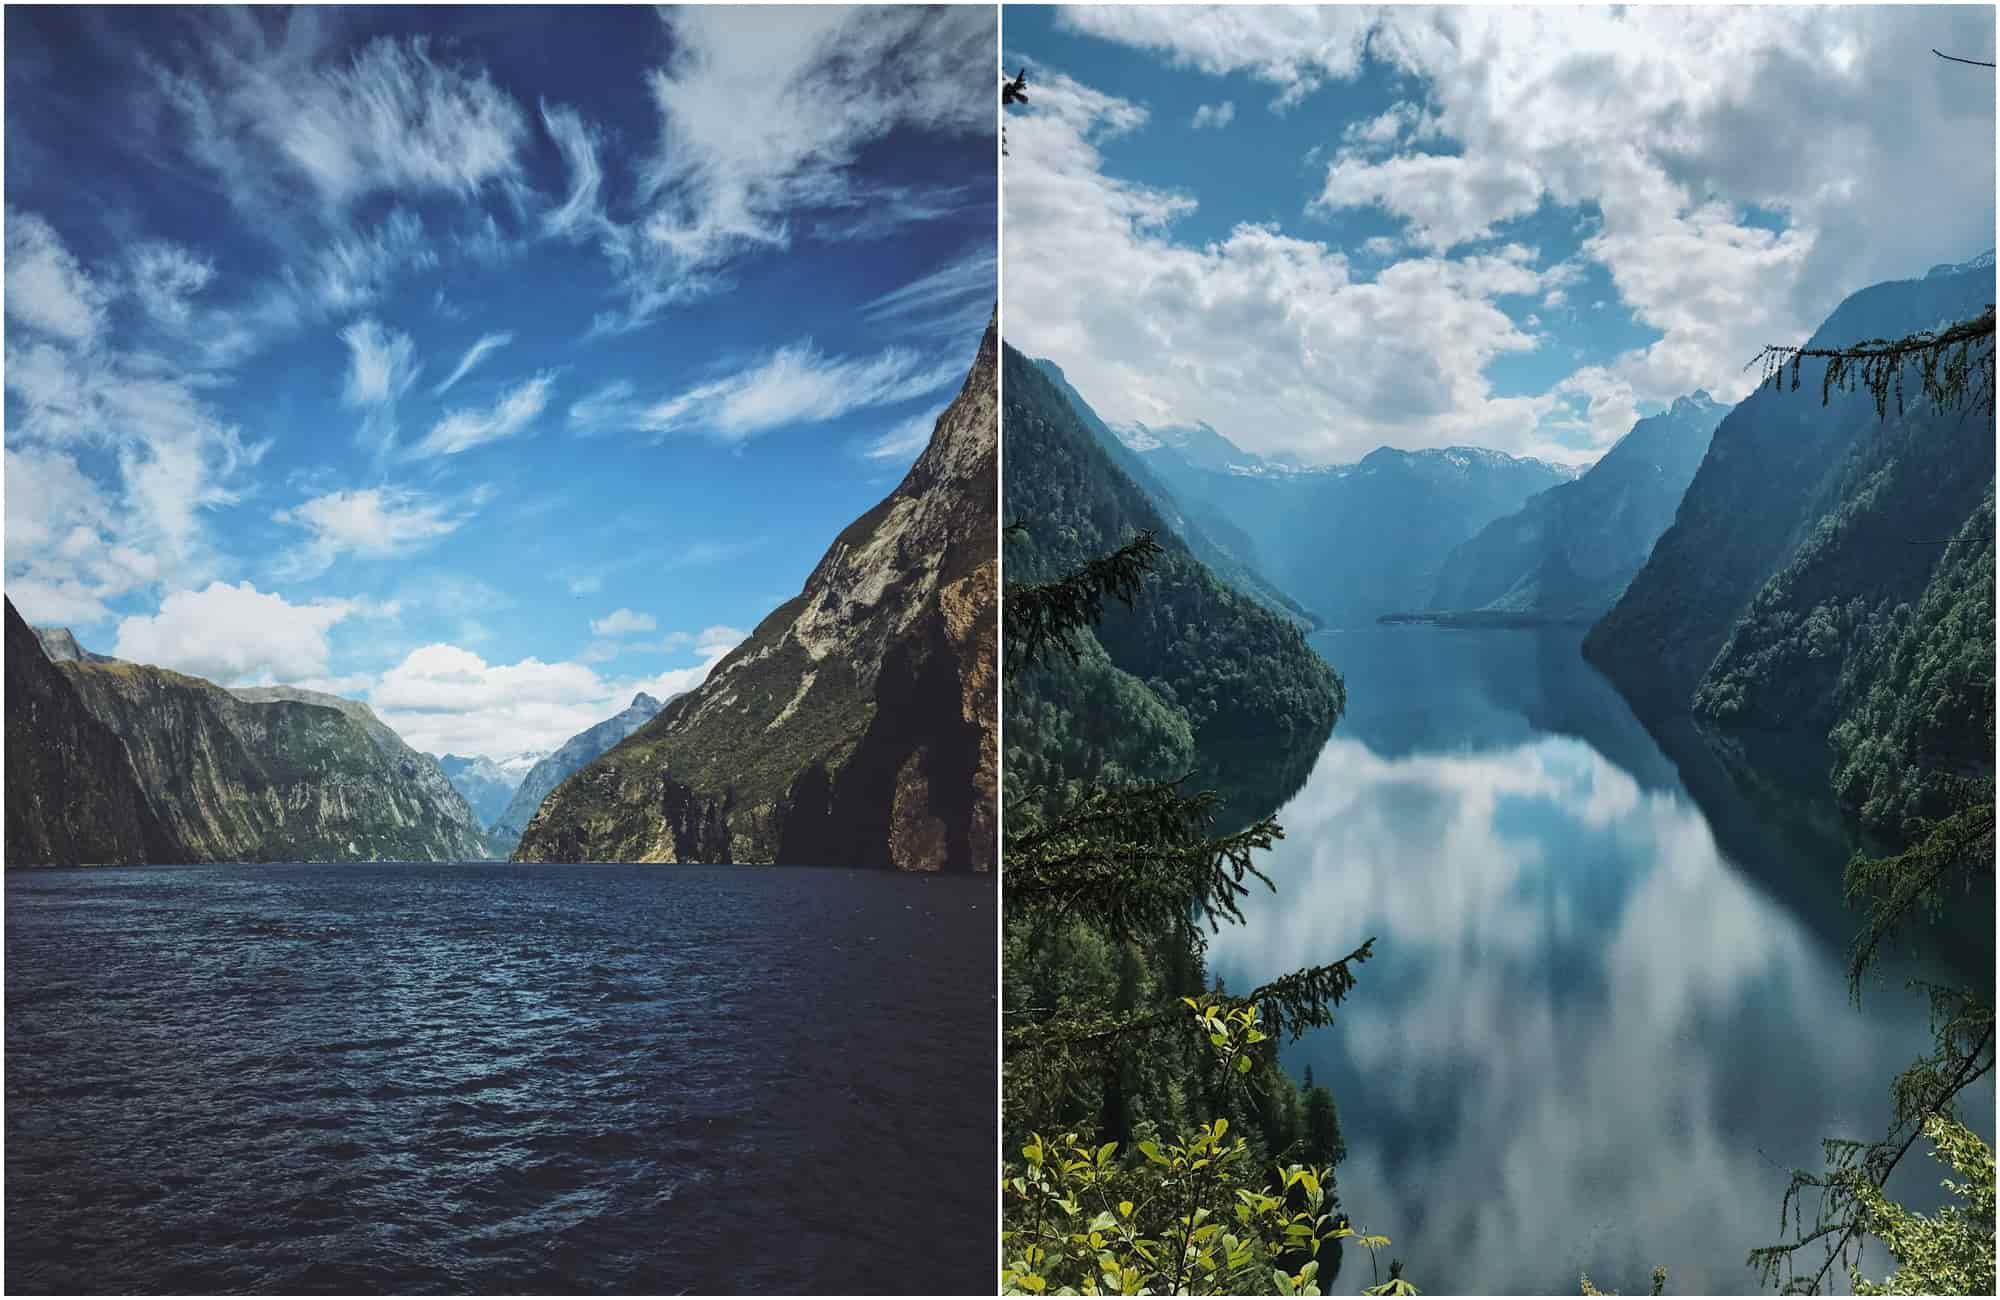 Voyage Allemagne - Nouvelle Zélande - Amplitudes